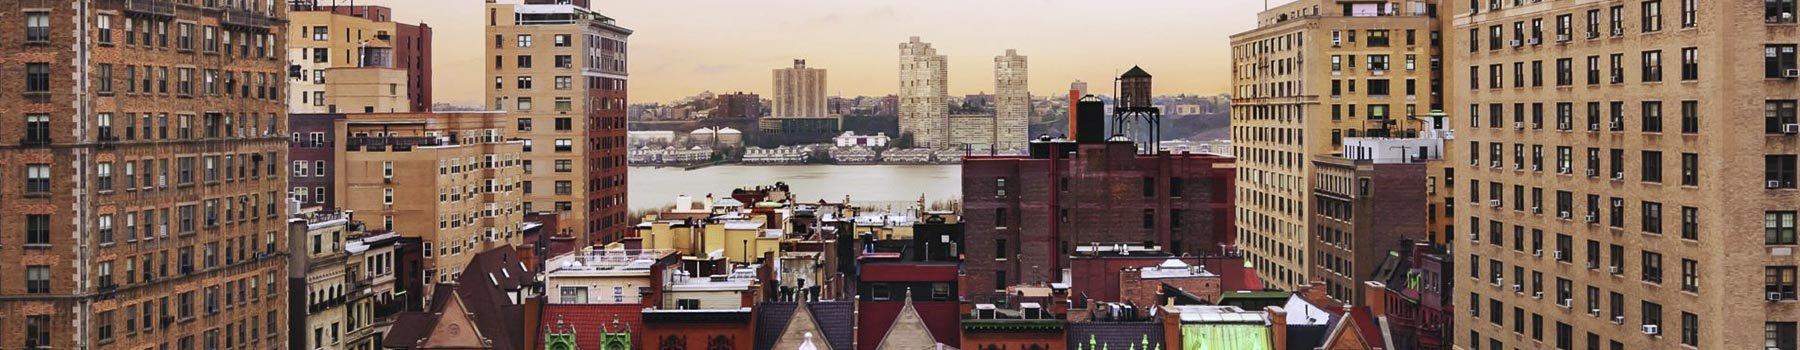 Explore the Neighborhood, New York